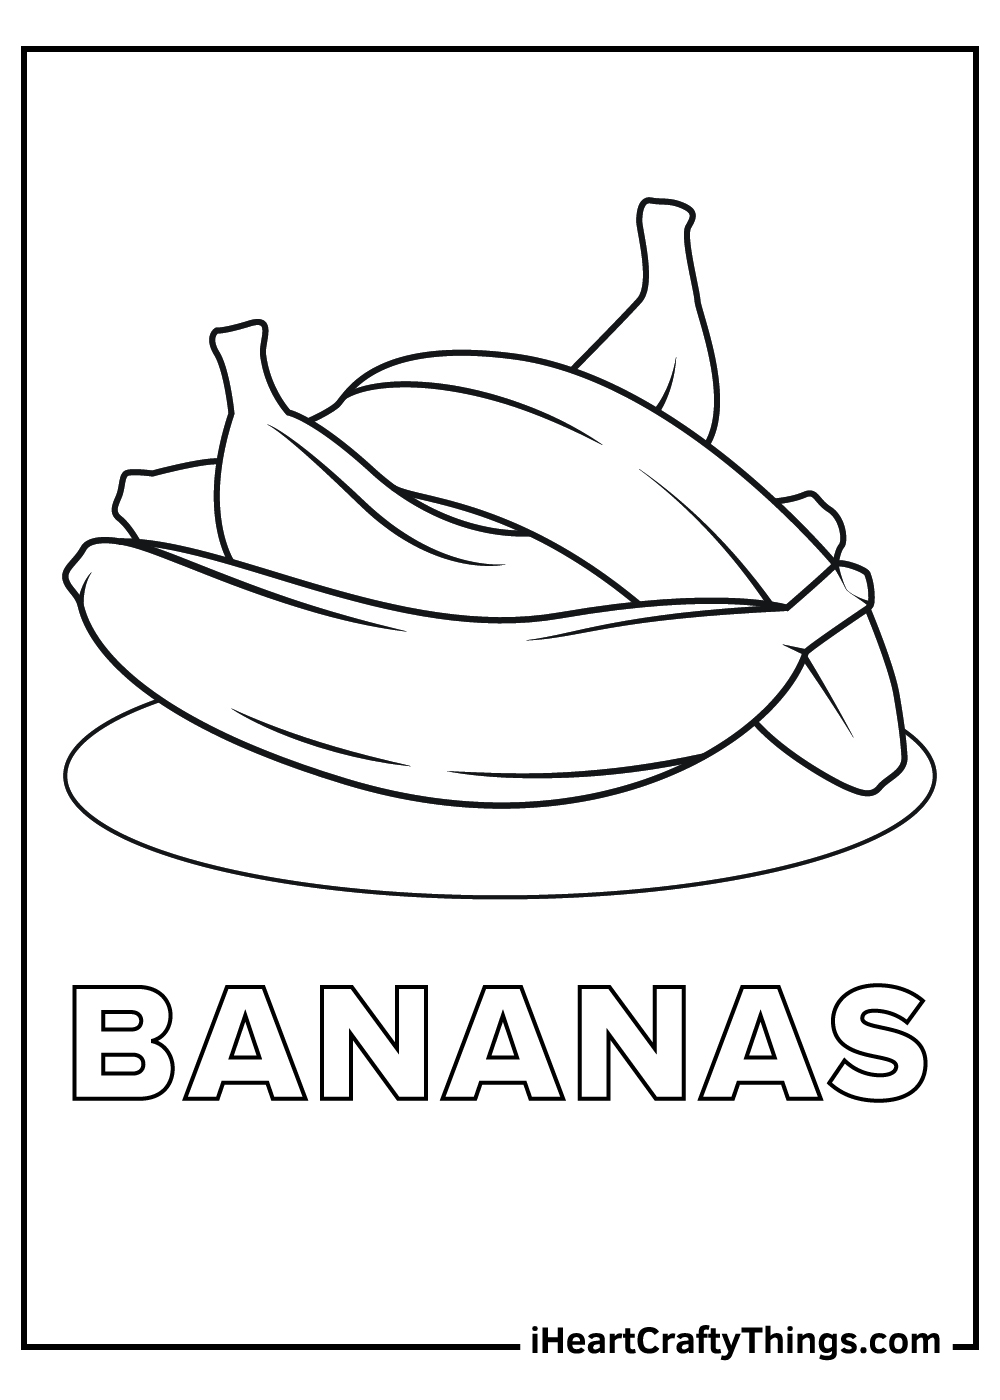 bananas coloring pagesfor kids free printable